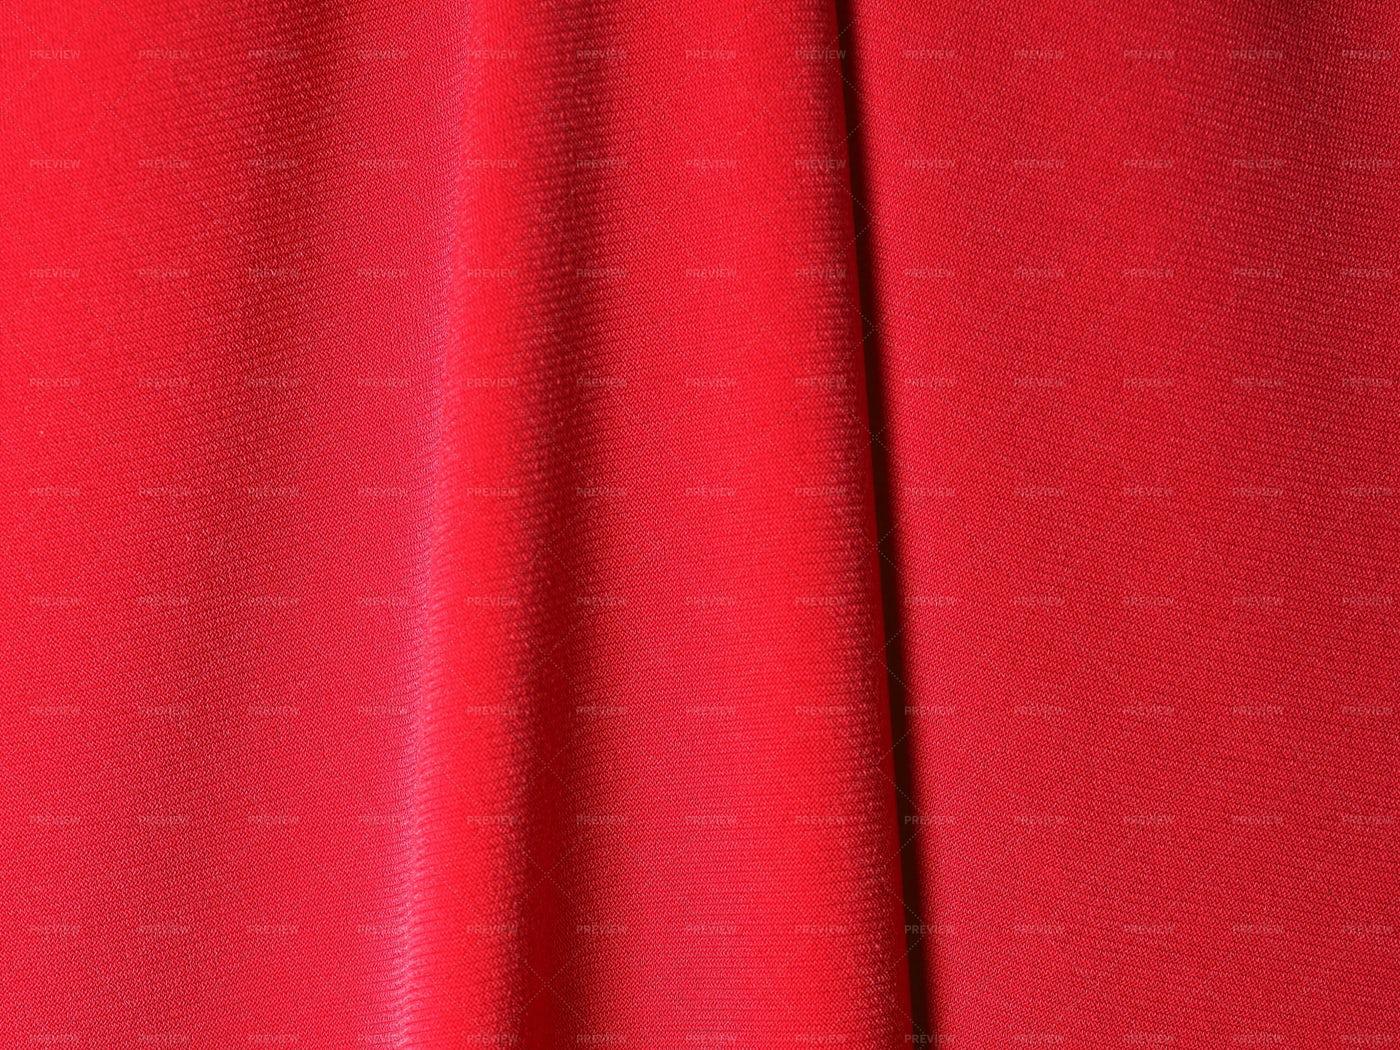 Red Curtain: Stock Photos